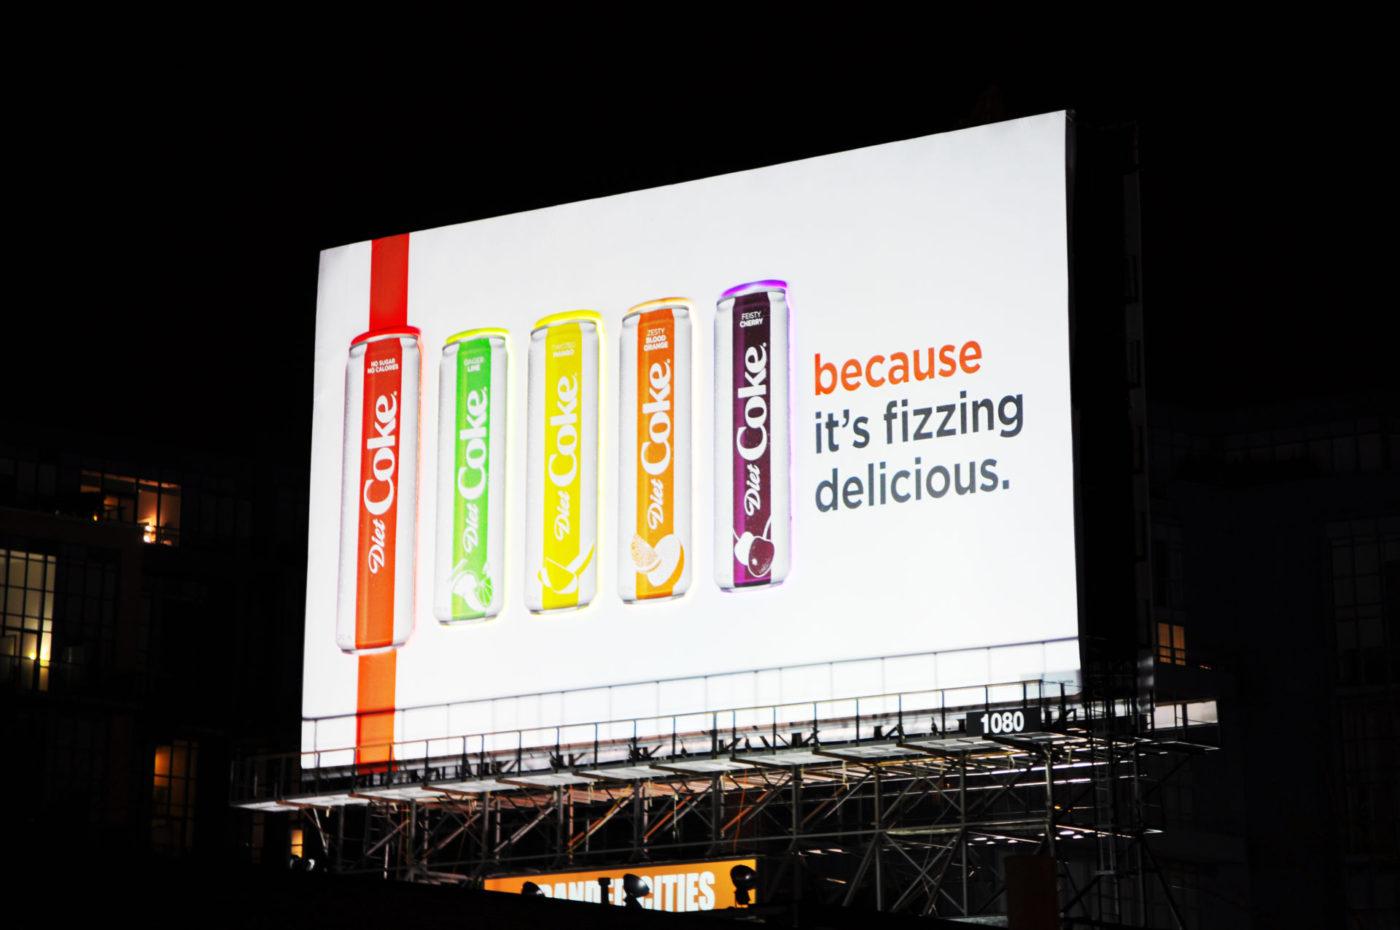 Diet Coke - Fizzing Delicious - Spectaculars - GEW 1080 (Toronto, Ontario)